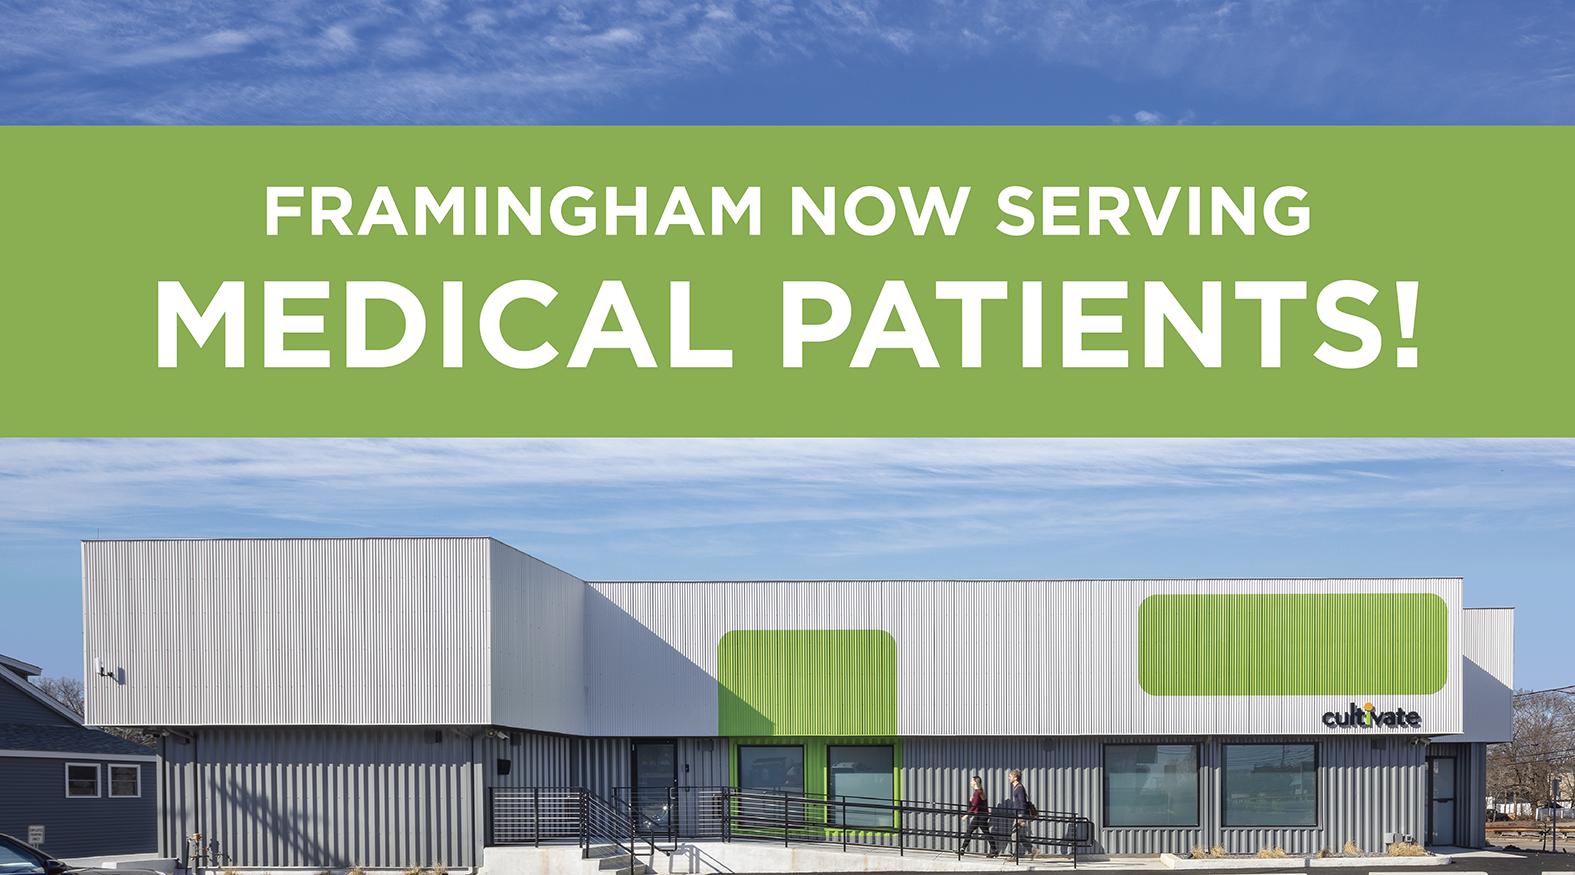 Framingham Now Serving Medical Patients!